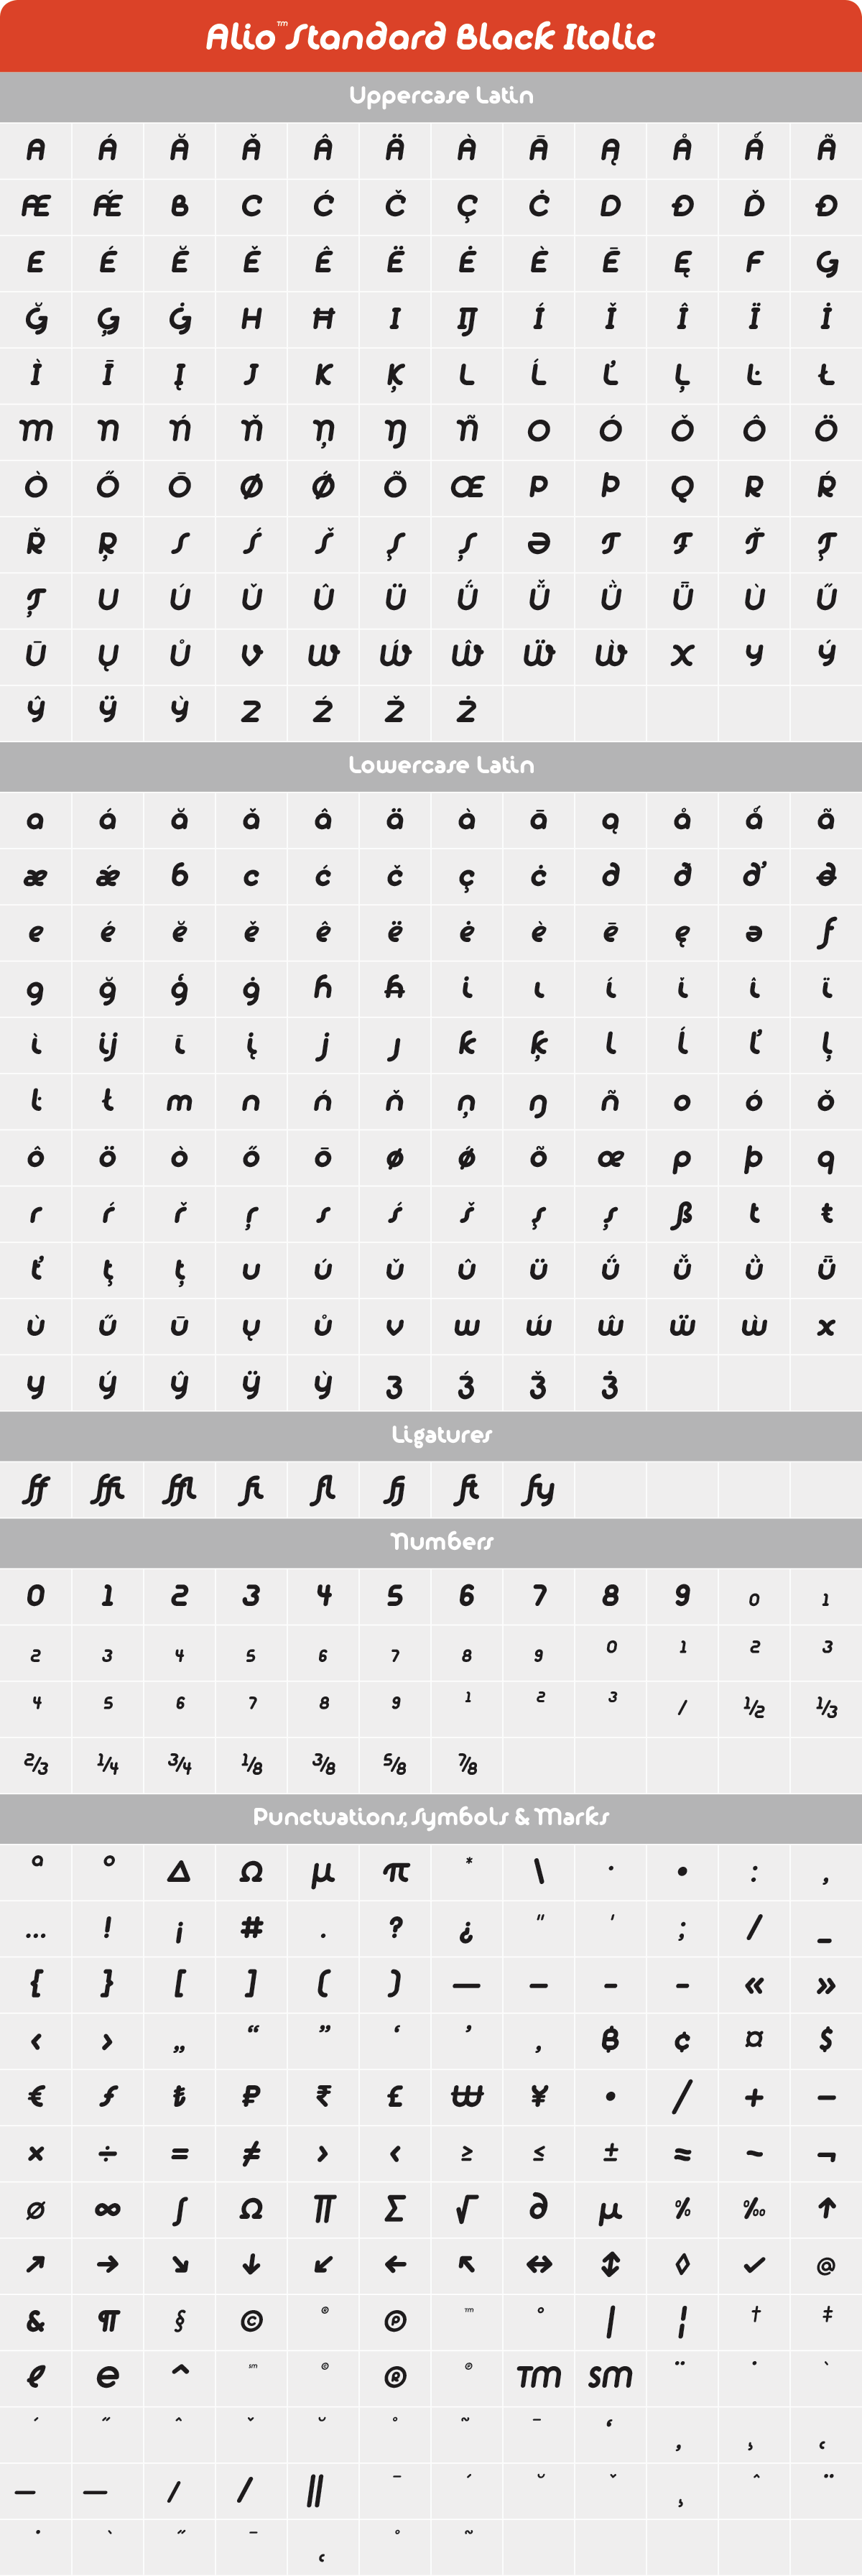 Alio Std Black Italic Glyph Set